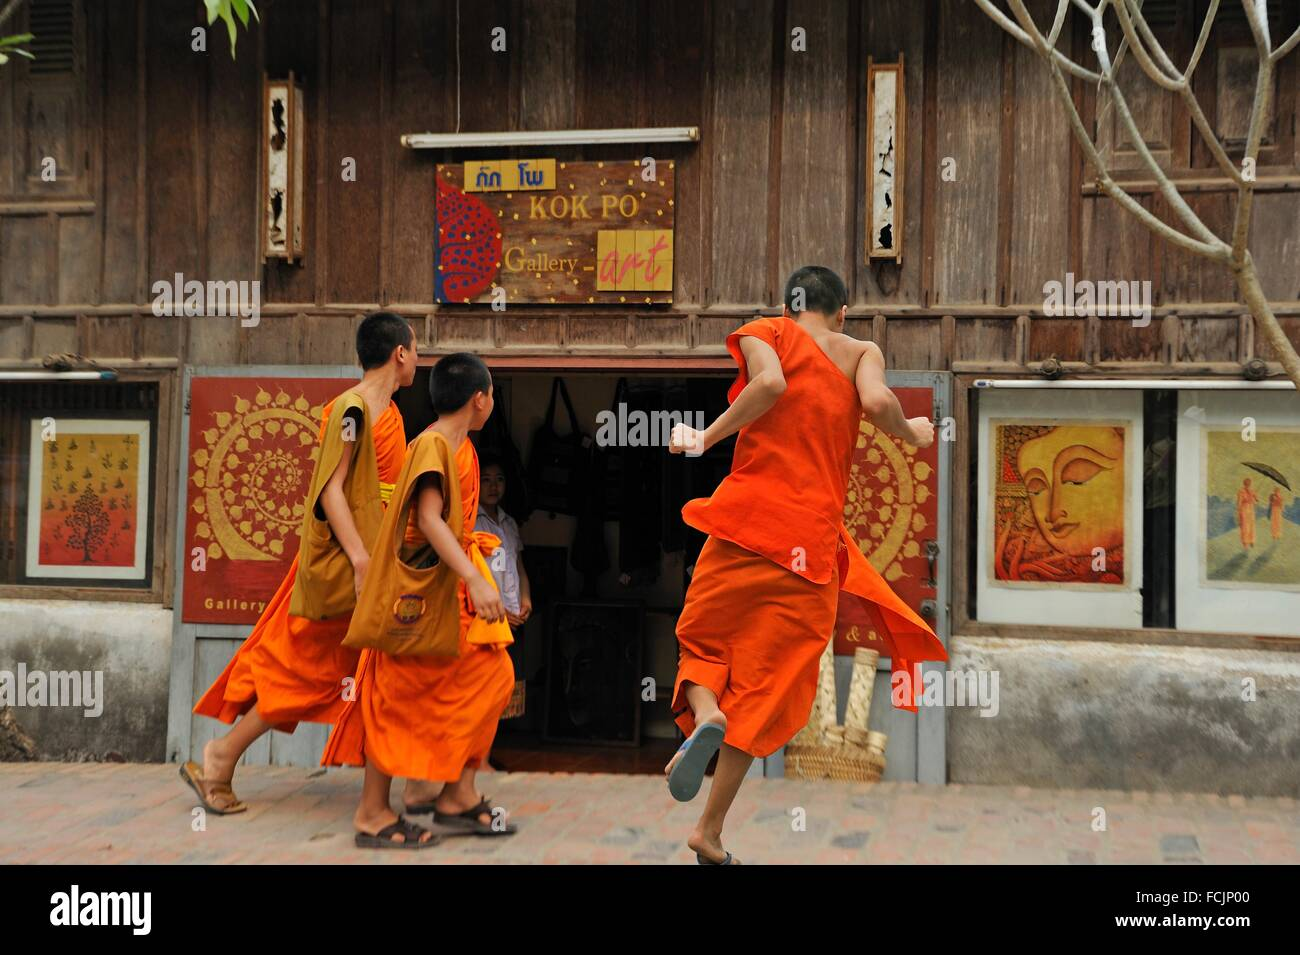 novice monks beside the Kok Po Art Gallery, Luang Prabang, Laos, Southeast Asia. - Stock Image